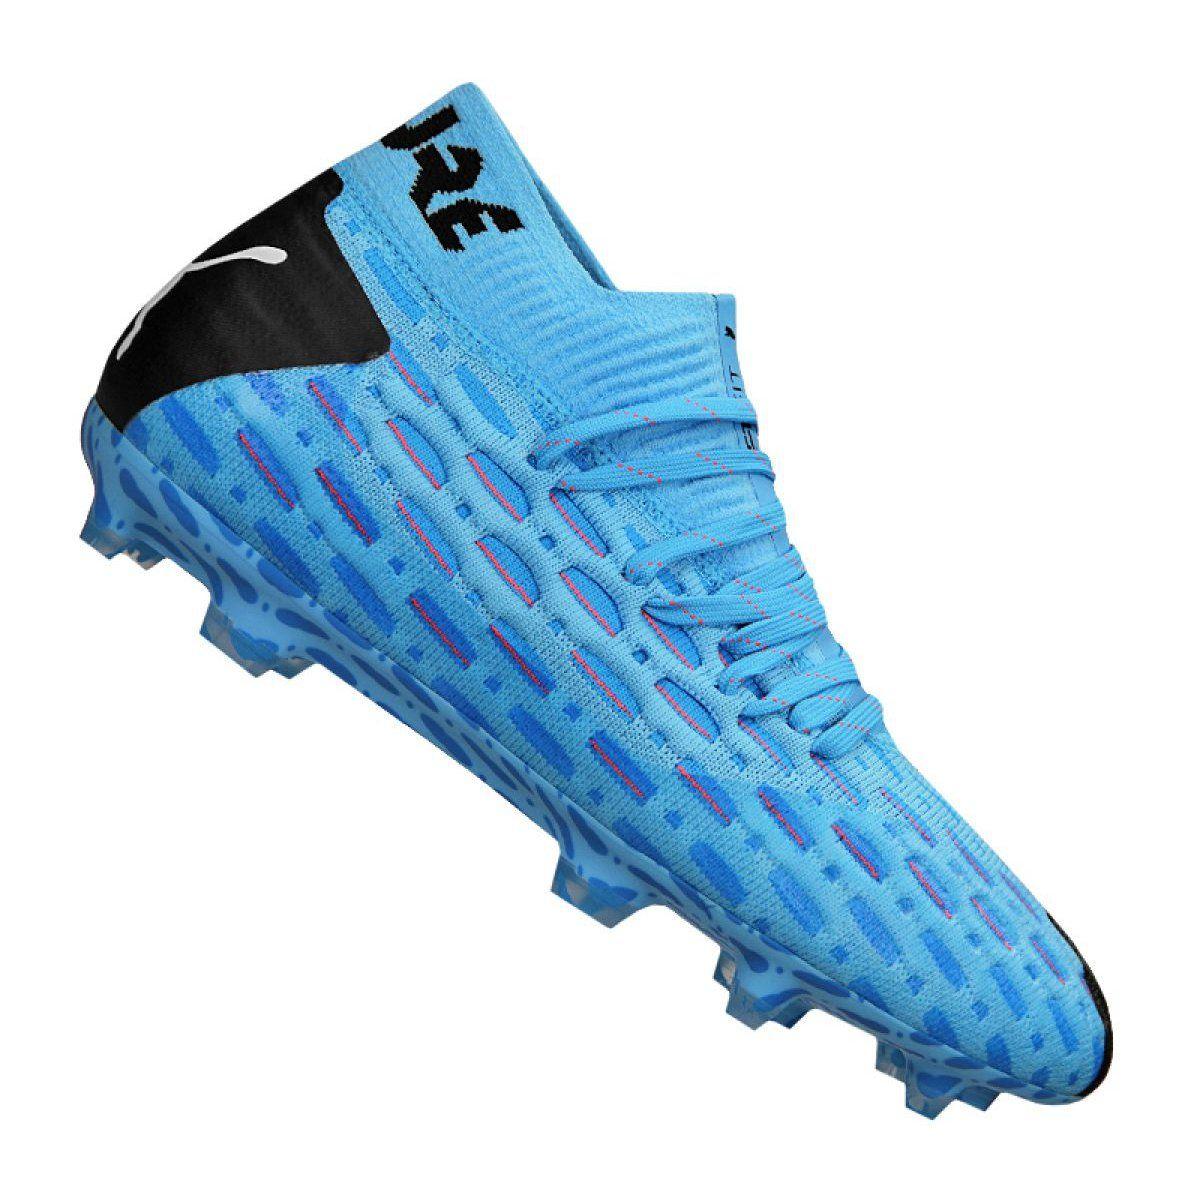 Buty Pilkarskie Puma Future 5 1 Netfit Fg Ag Jr 105805 01 Niebieskie Niebieskie Football Boots Puma Junior Shoes